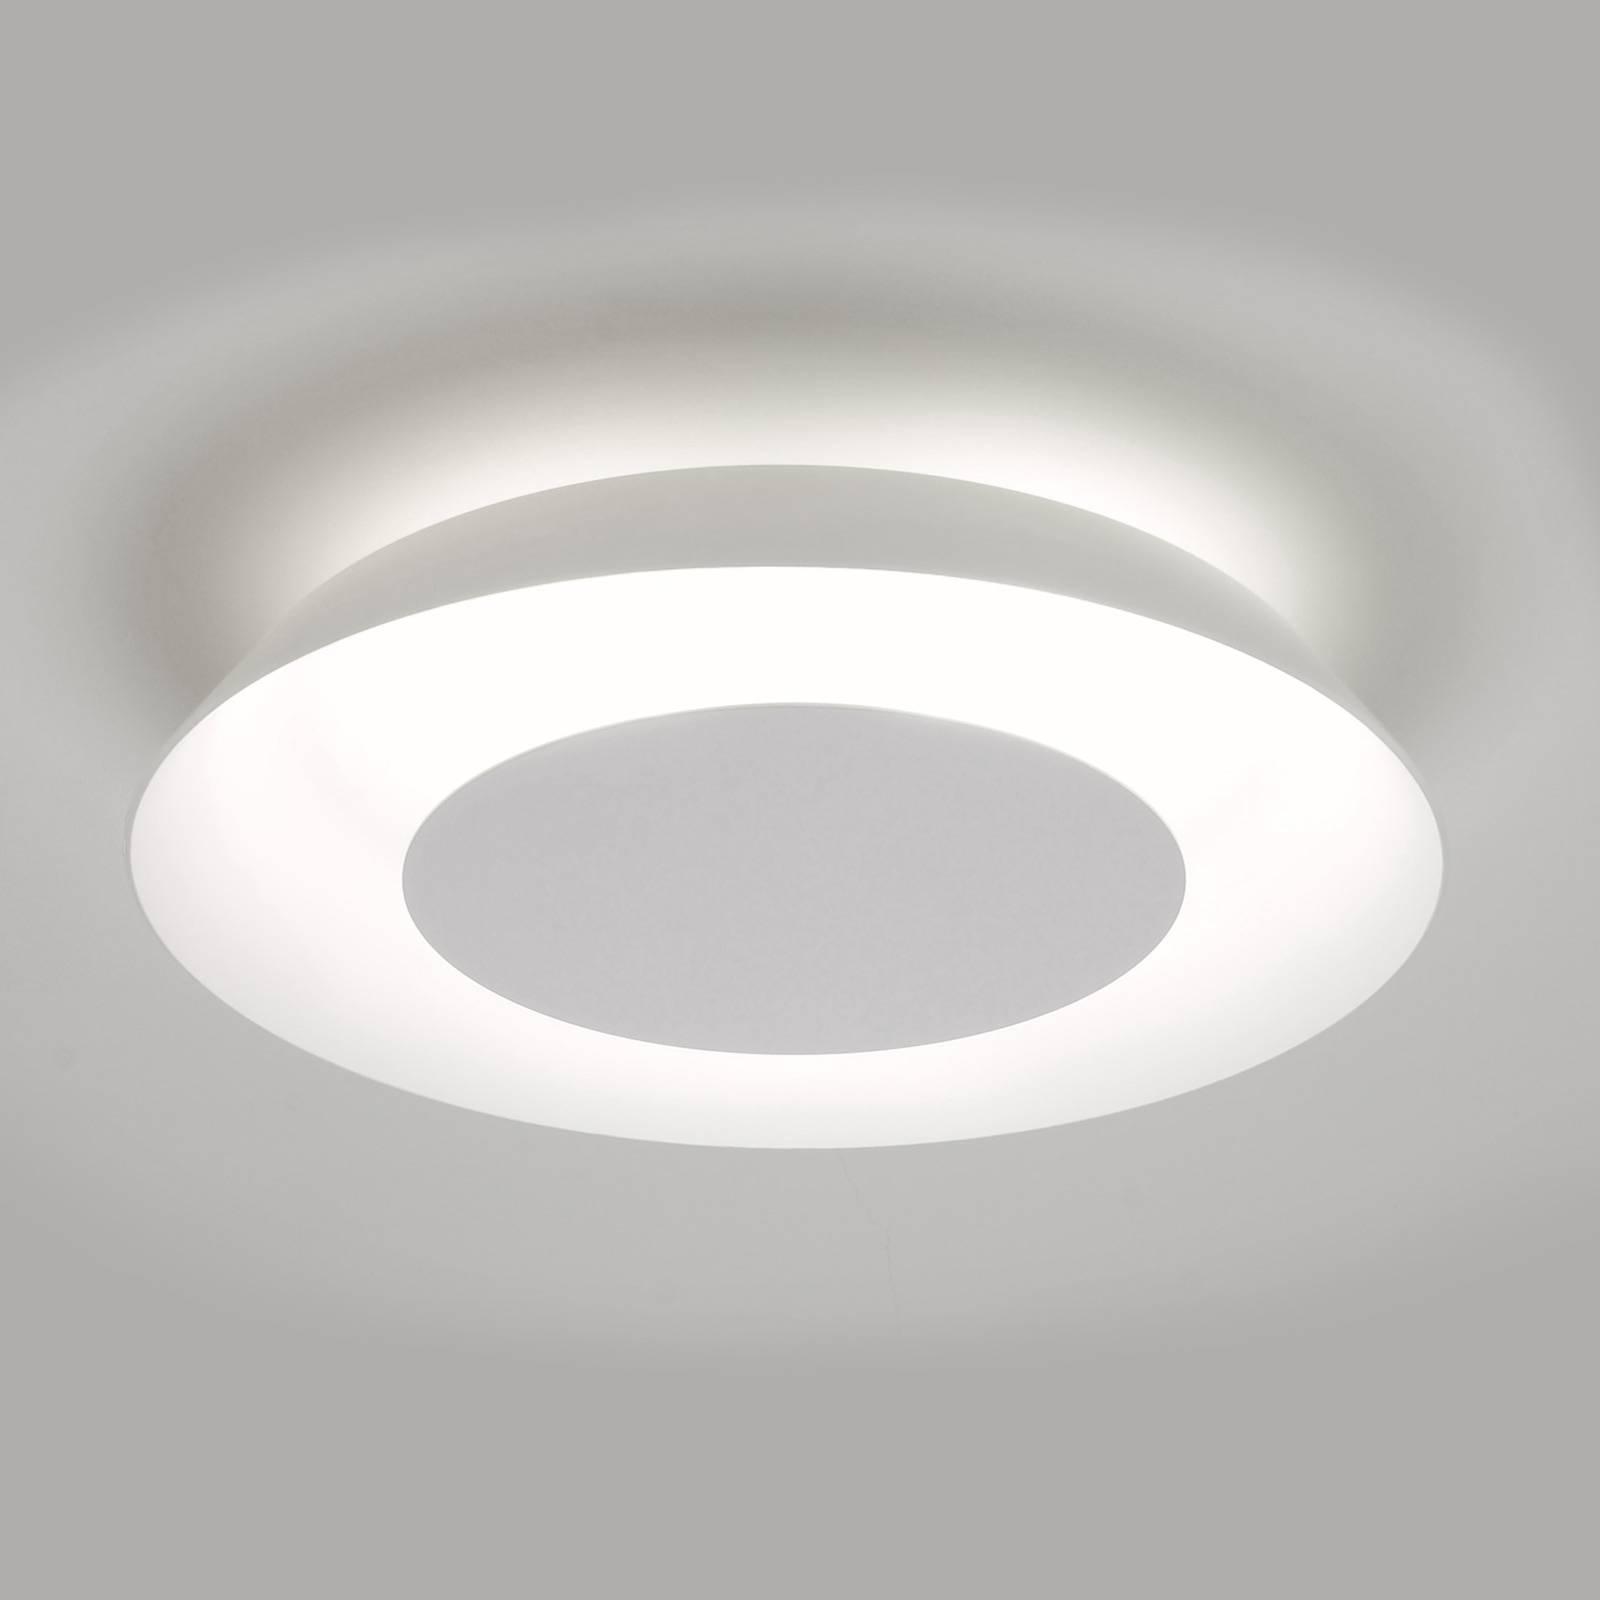 Casablanca Torno LED-kattovalaisin, Ø 40 cm